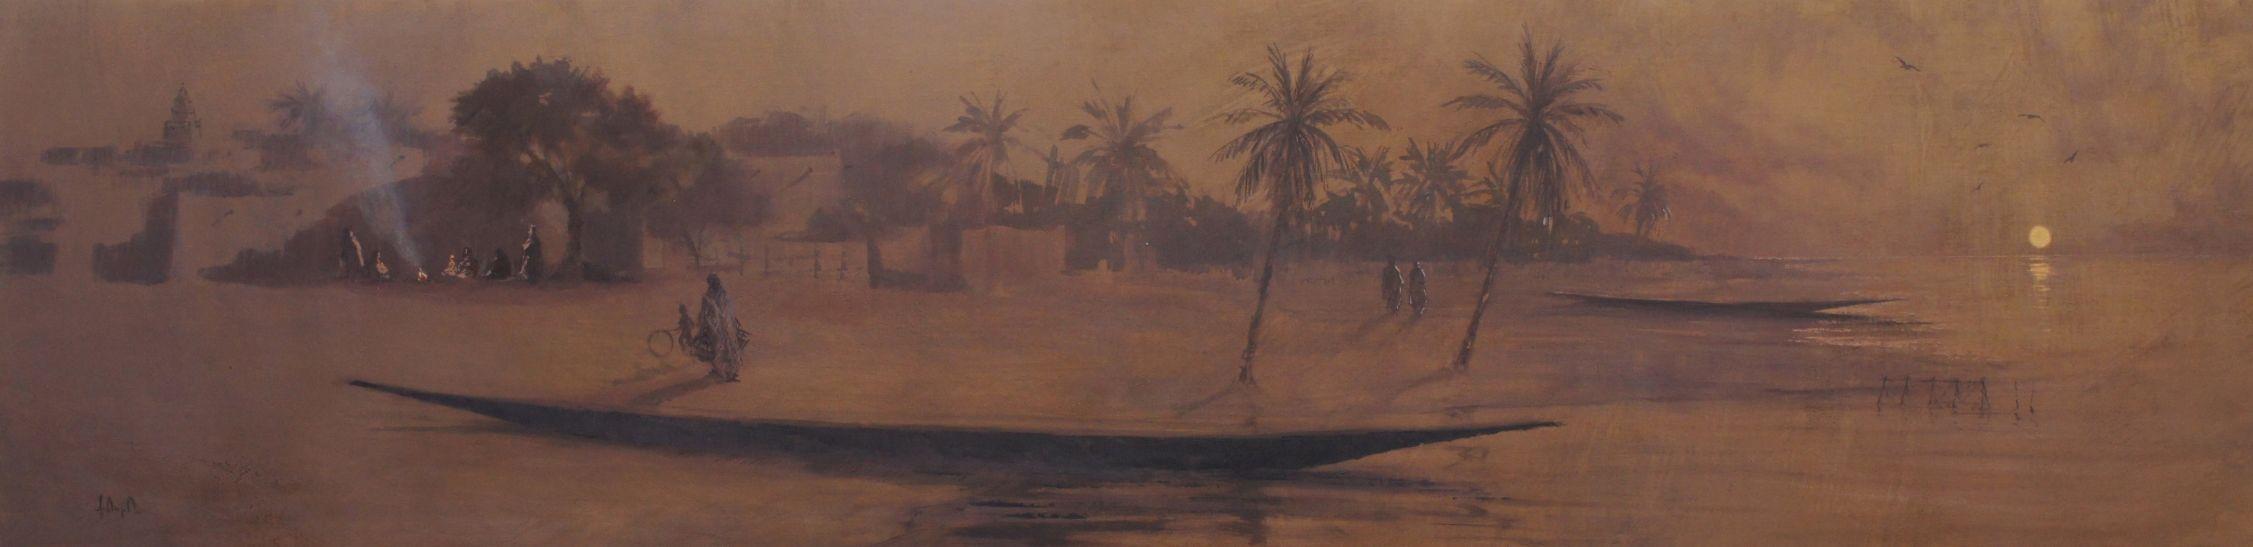 resized_012 Atardecer en el río 50 x 200 cm